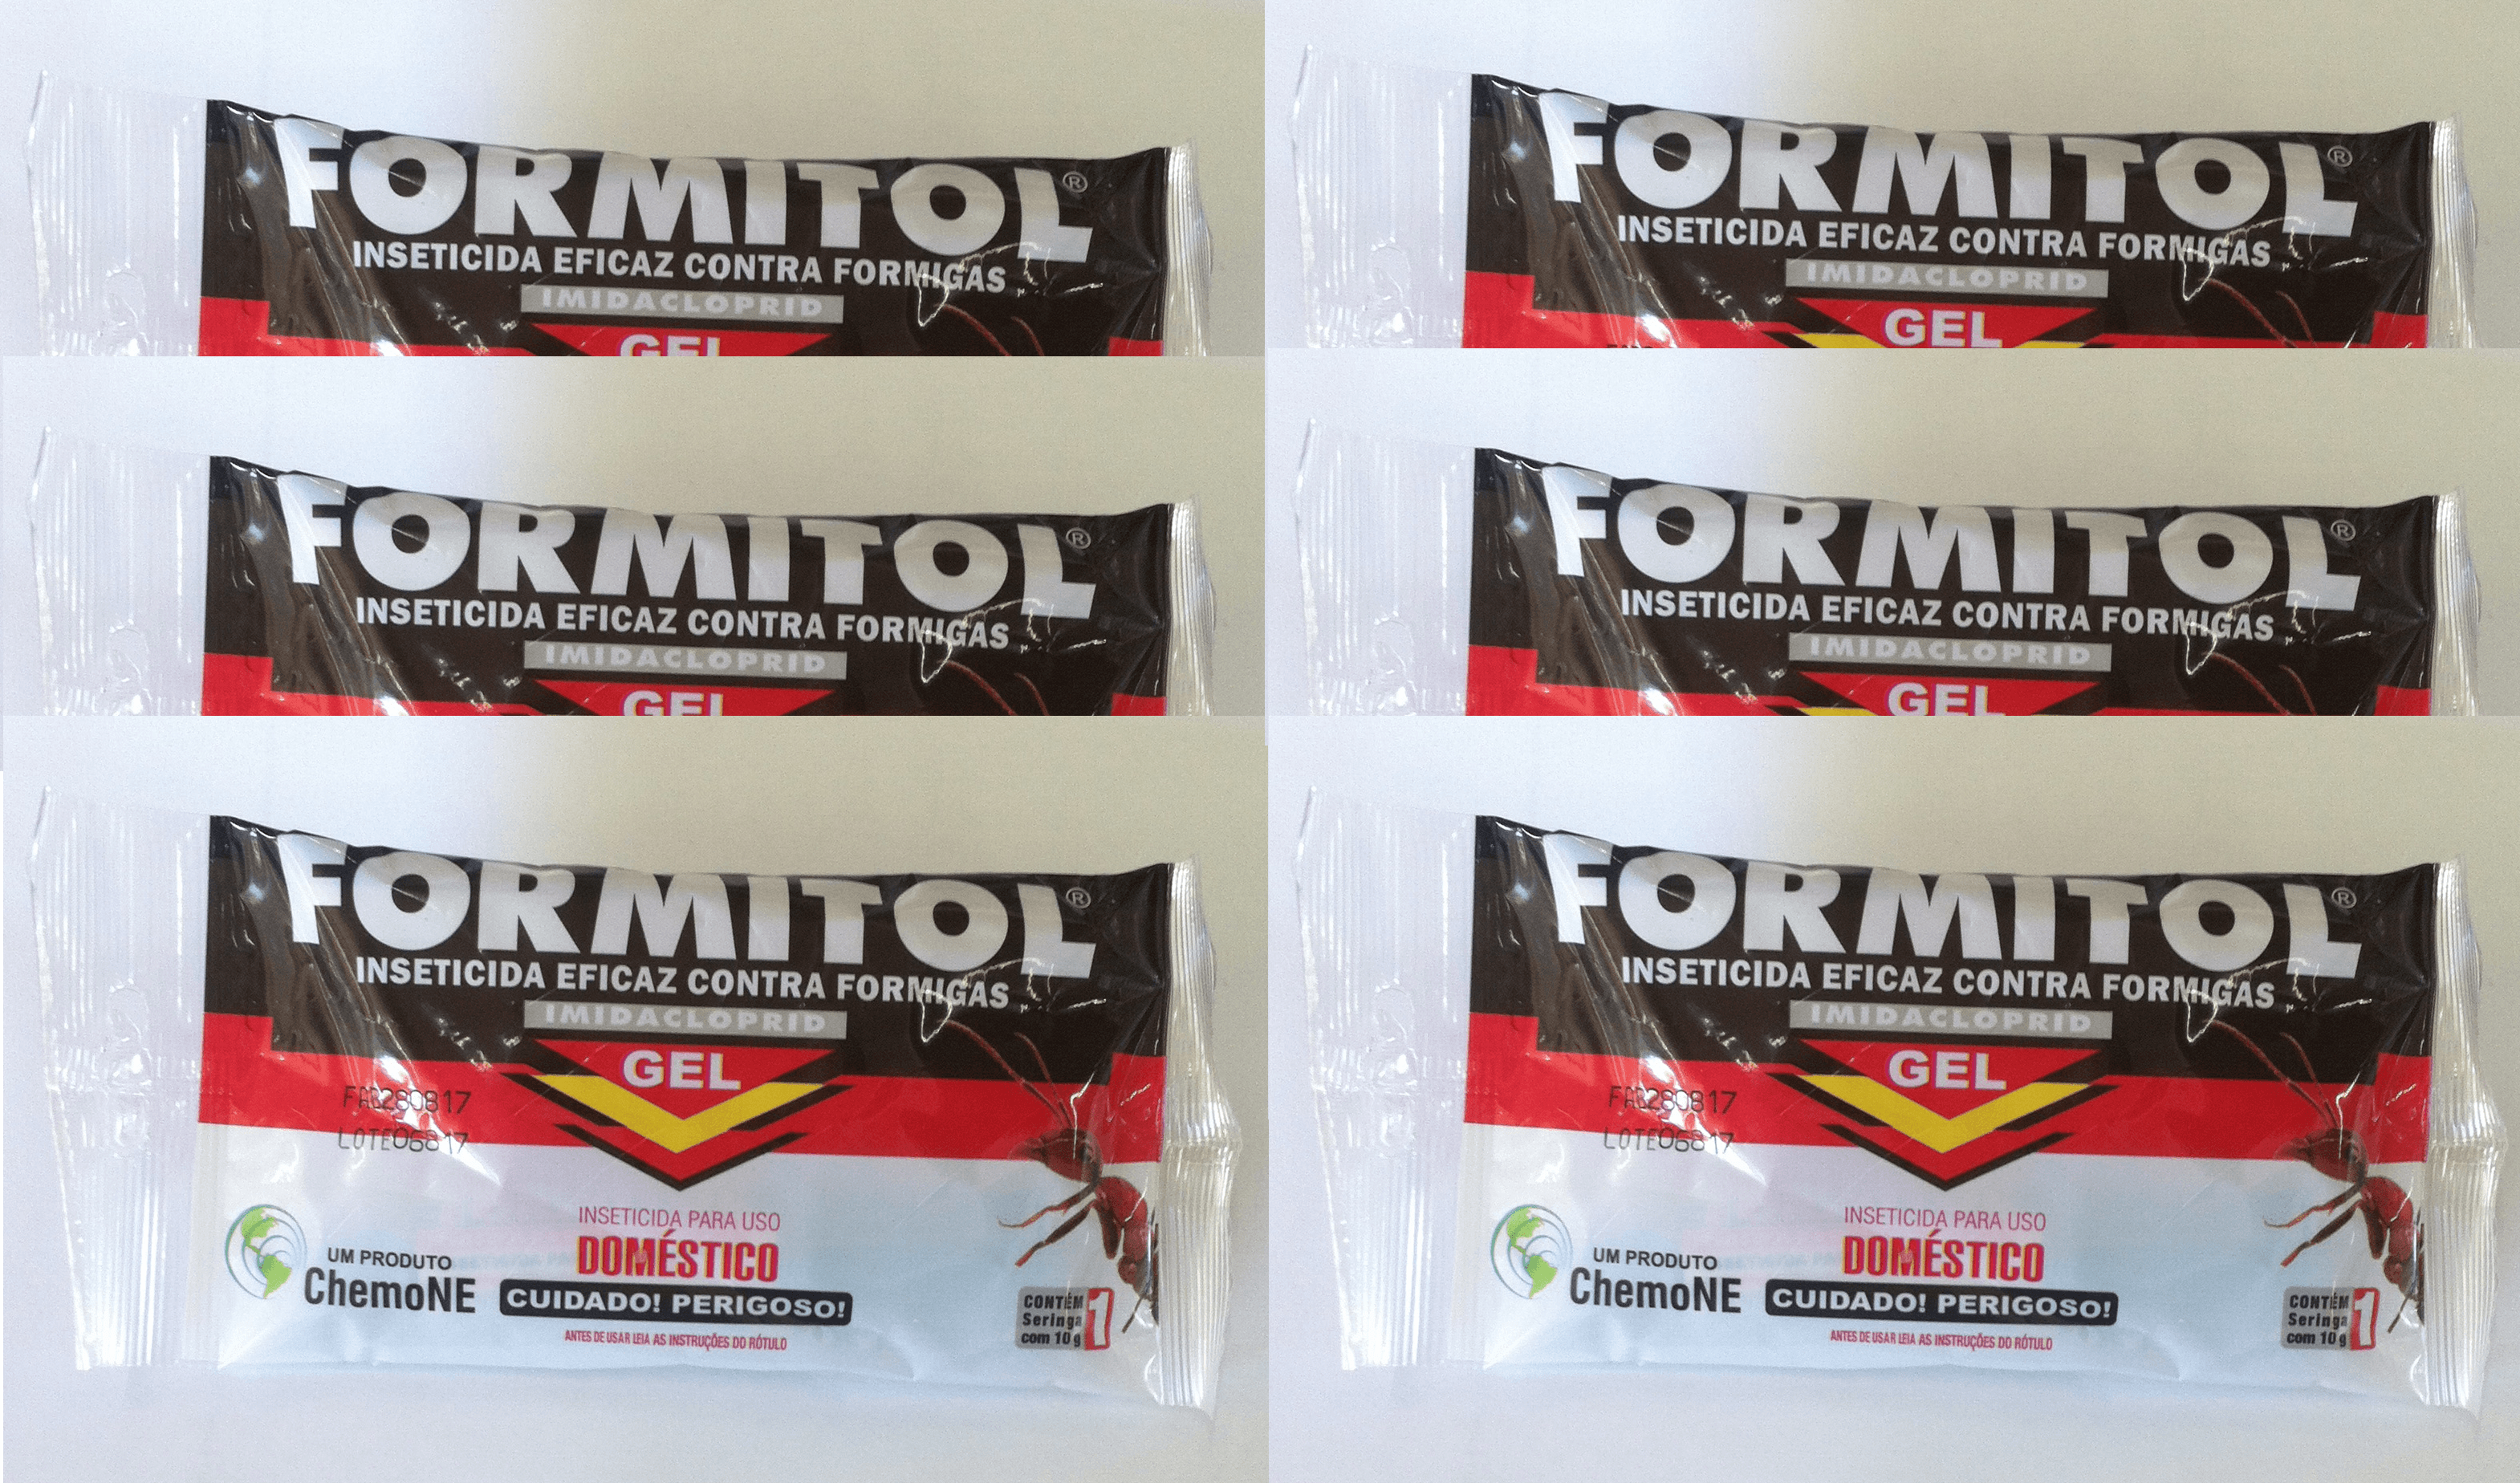 Formitol Formicida Gel 10g- Kit com 6 unidades